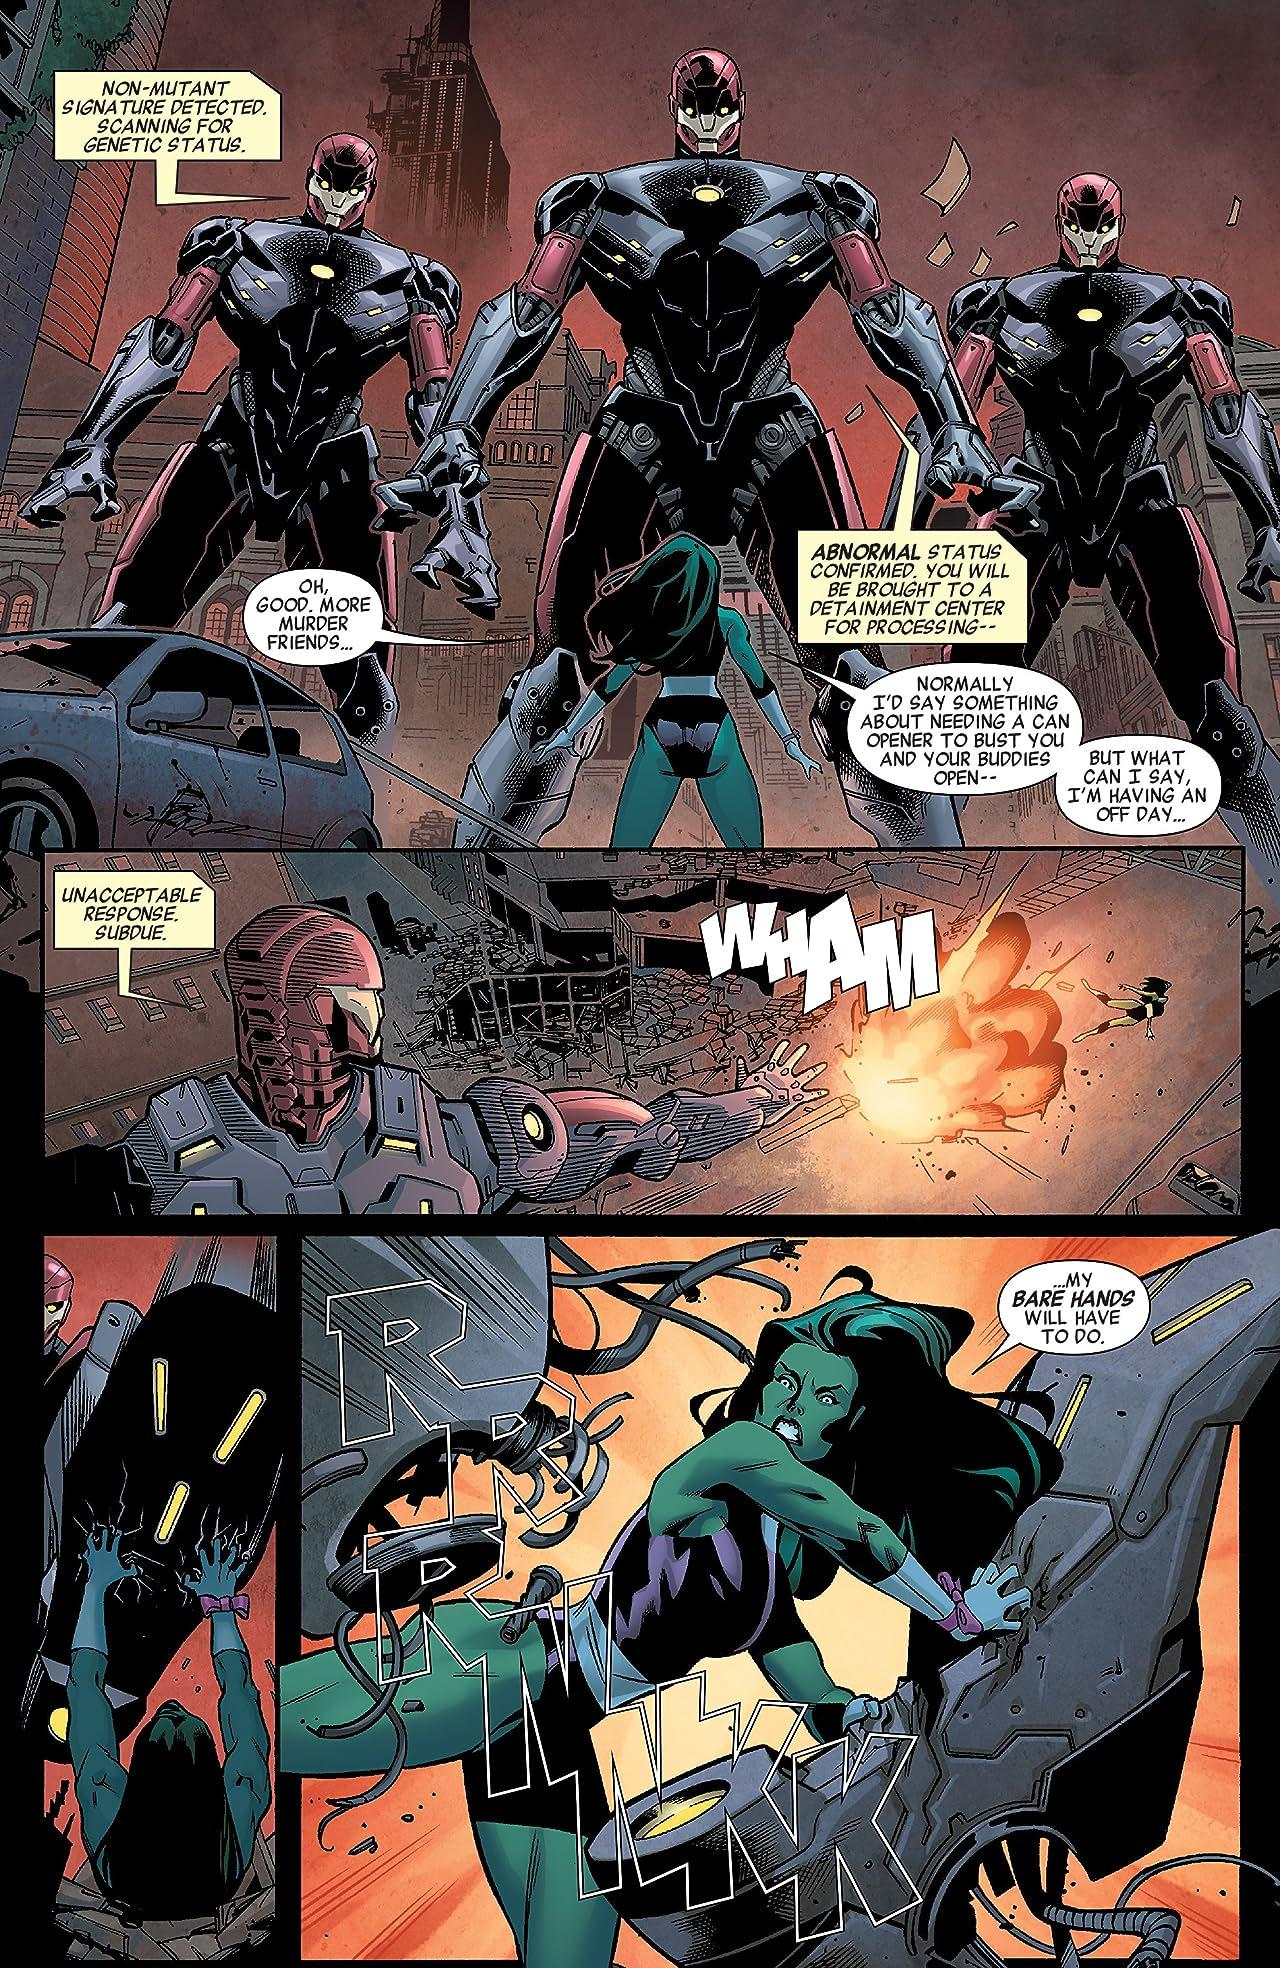 A-Force (2015) #3